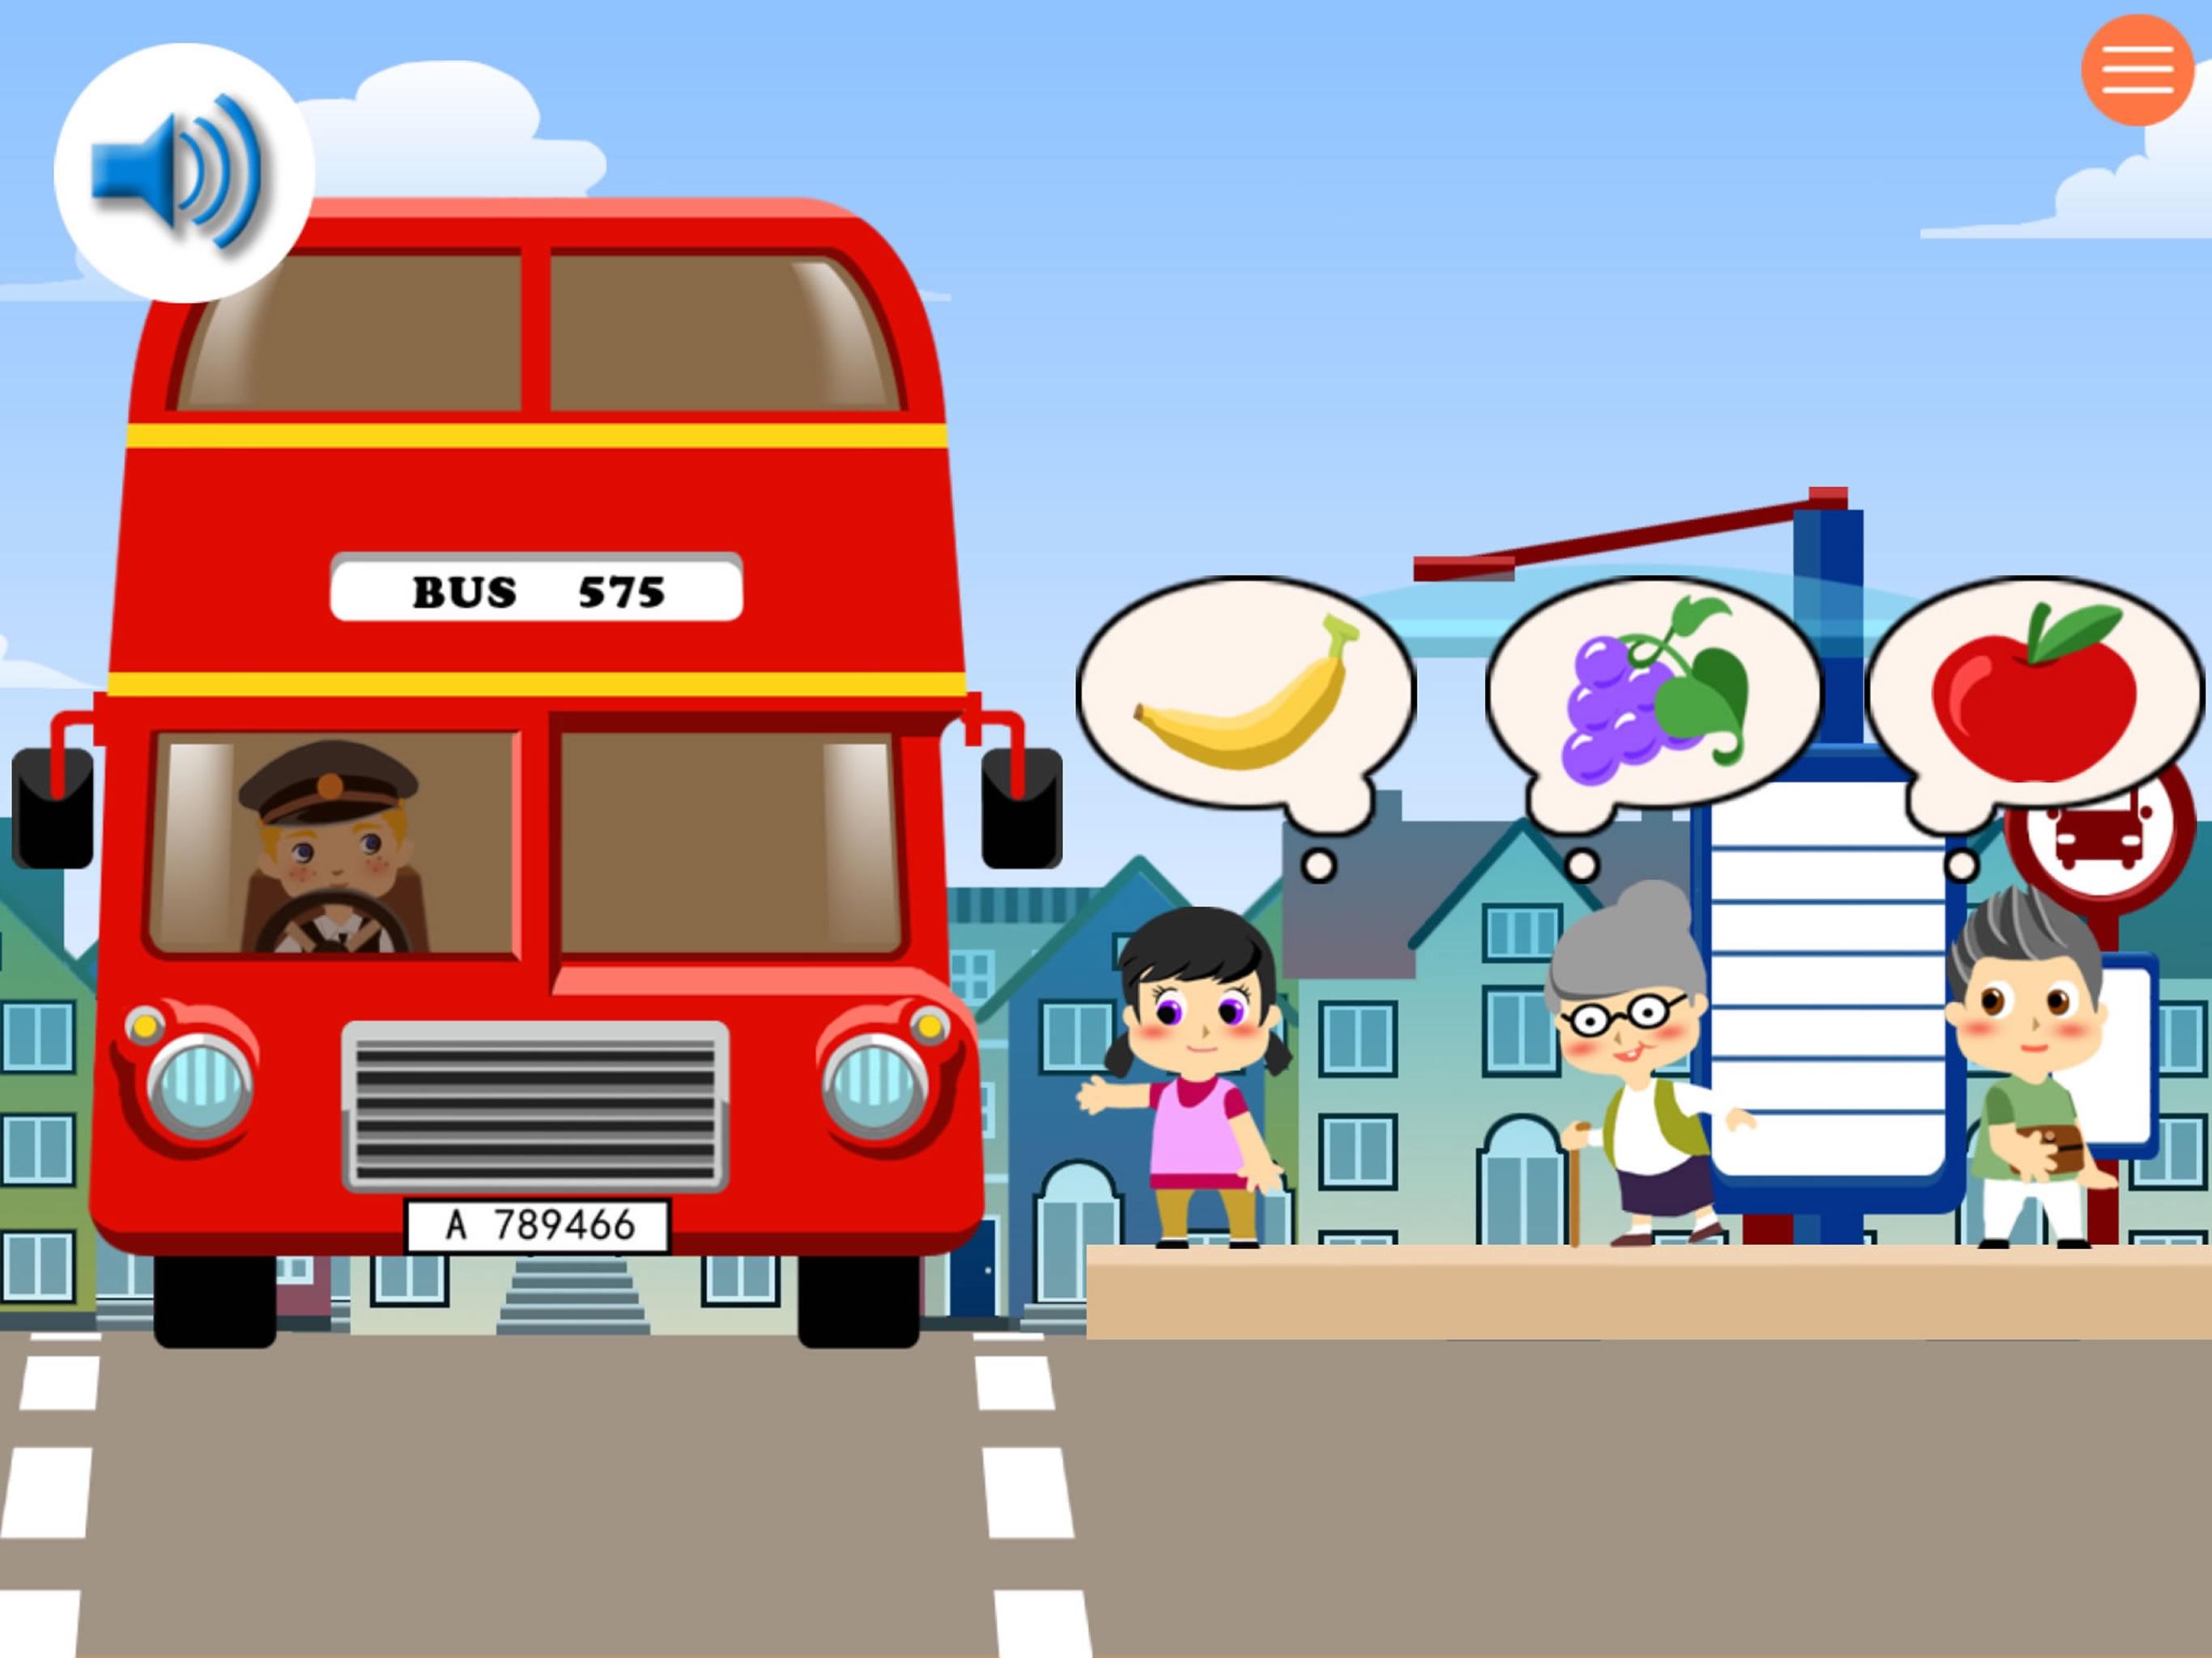 bus driver - game for kids:宝宝当公共汽车巴士司机-儿童拼图游戏图片